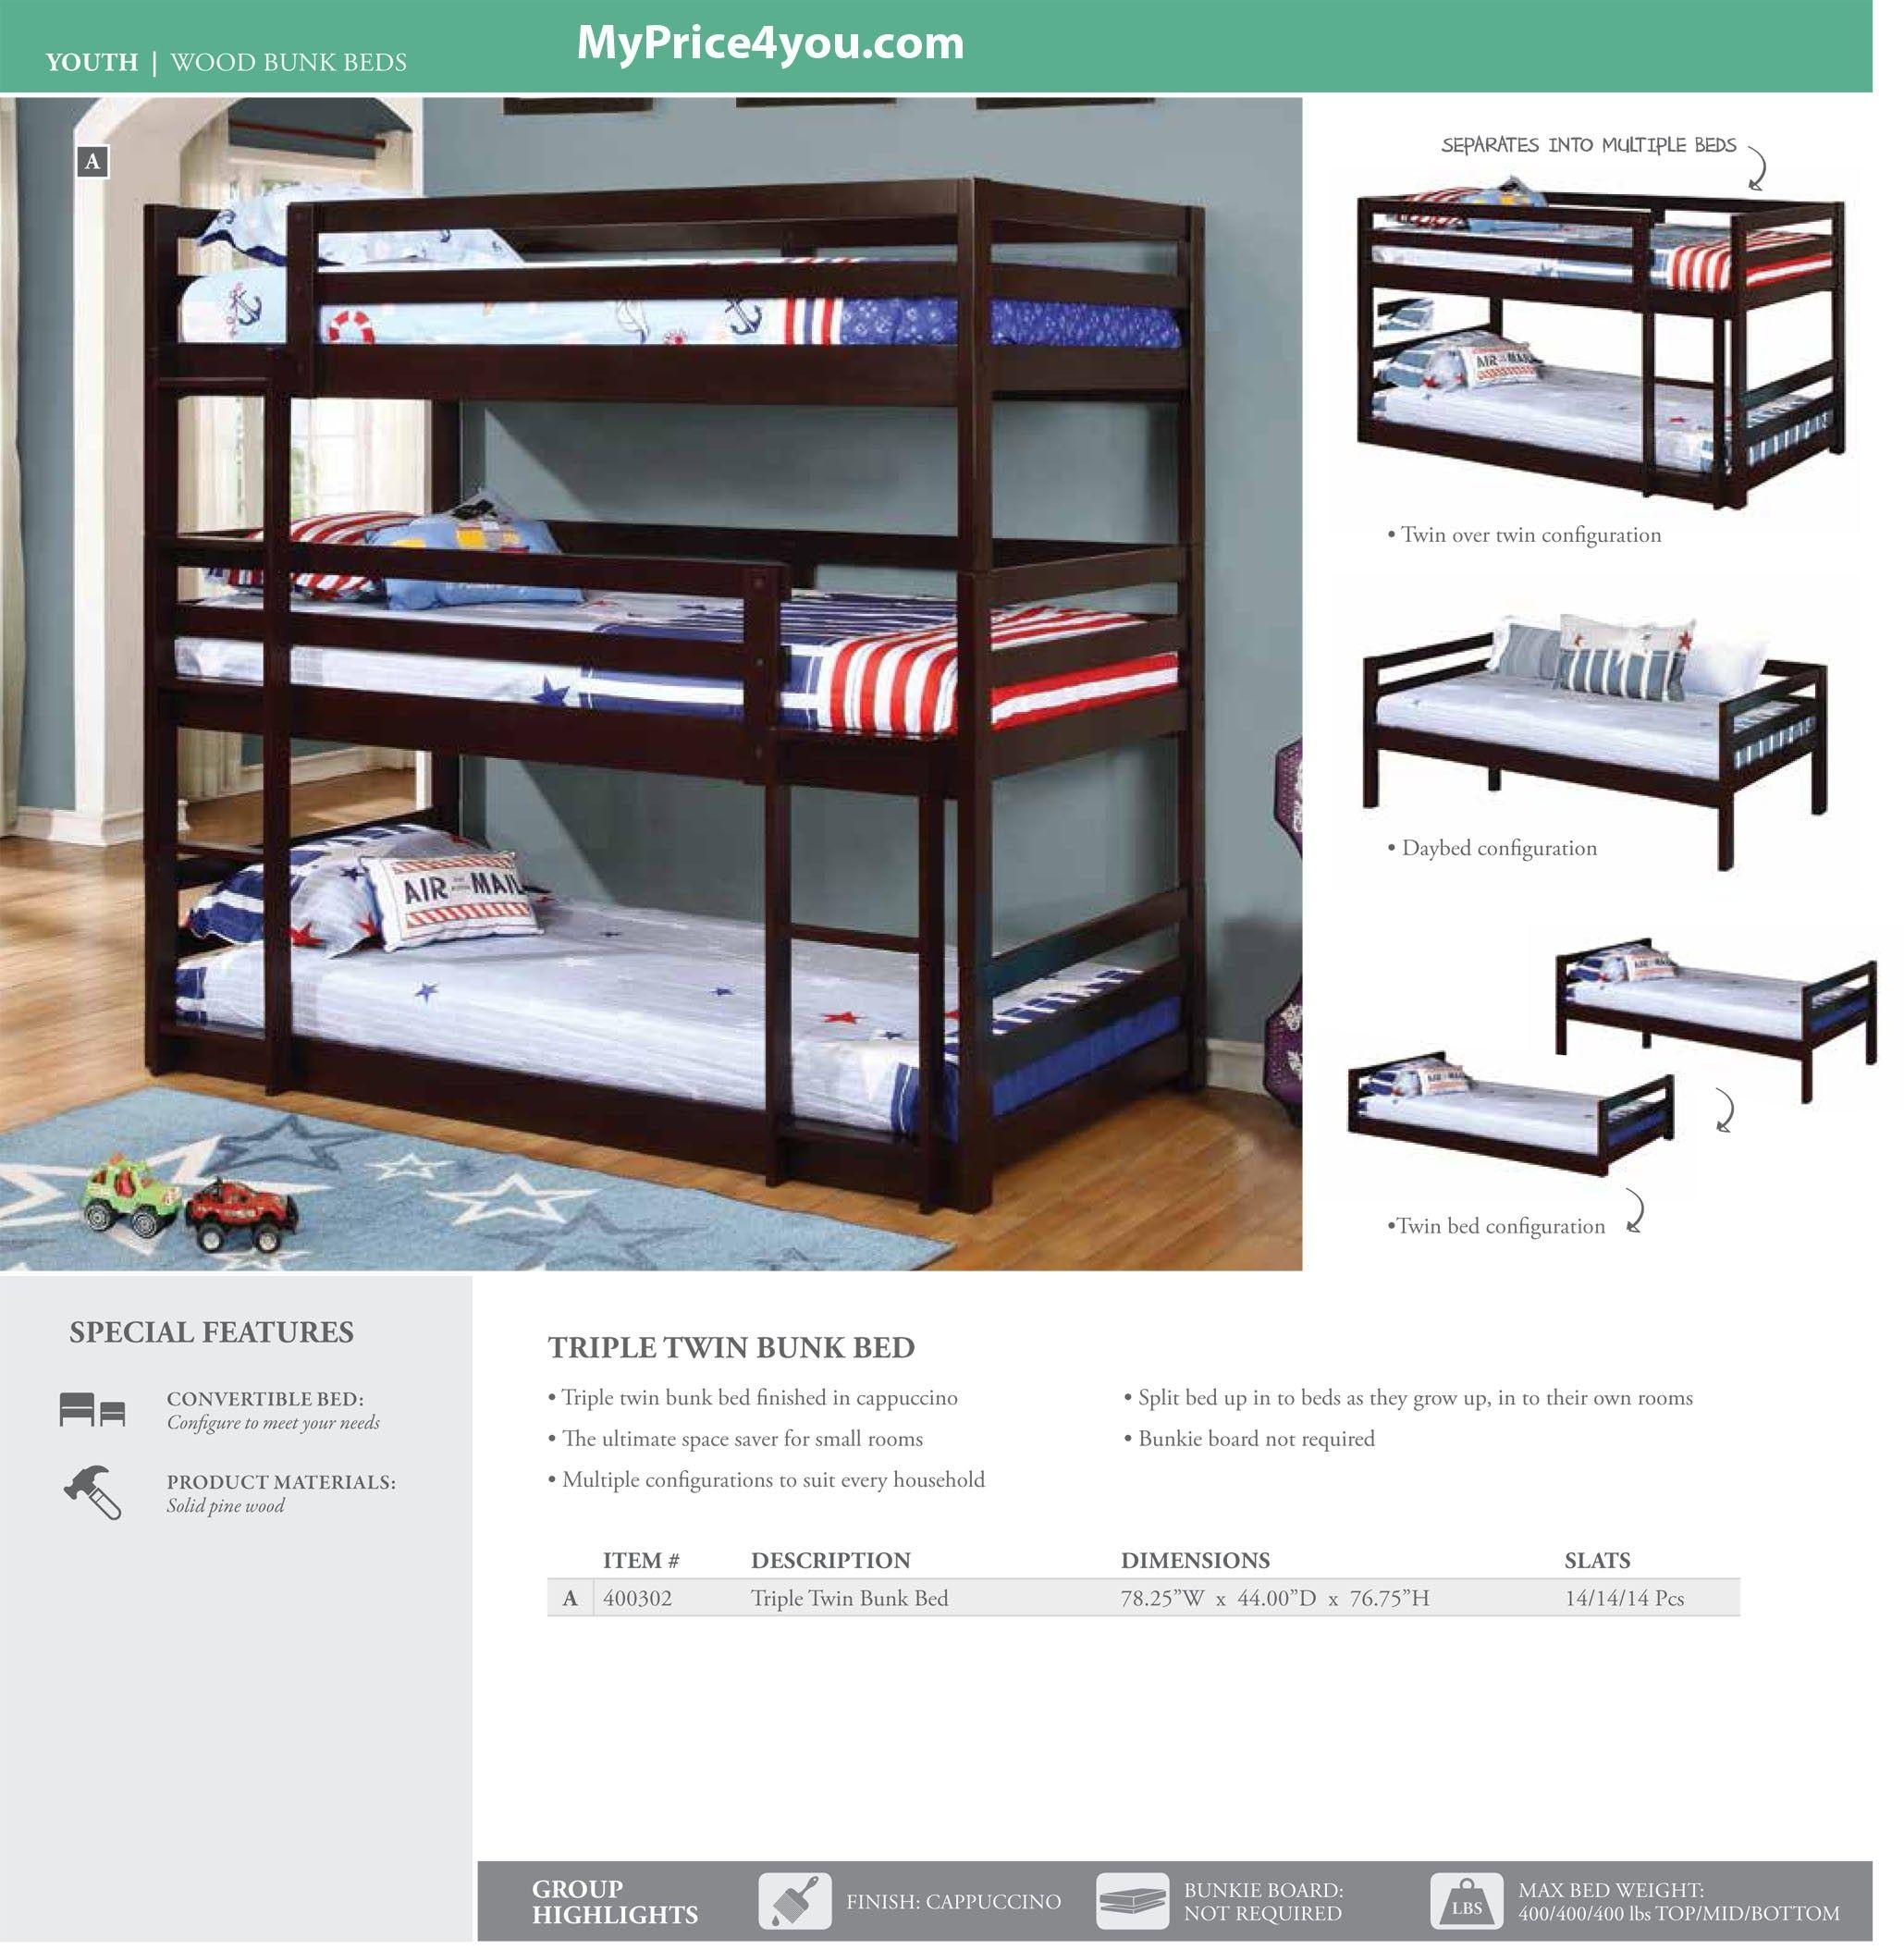 Triple Twin Bunk Bed Cuccino 400302 By Coaster